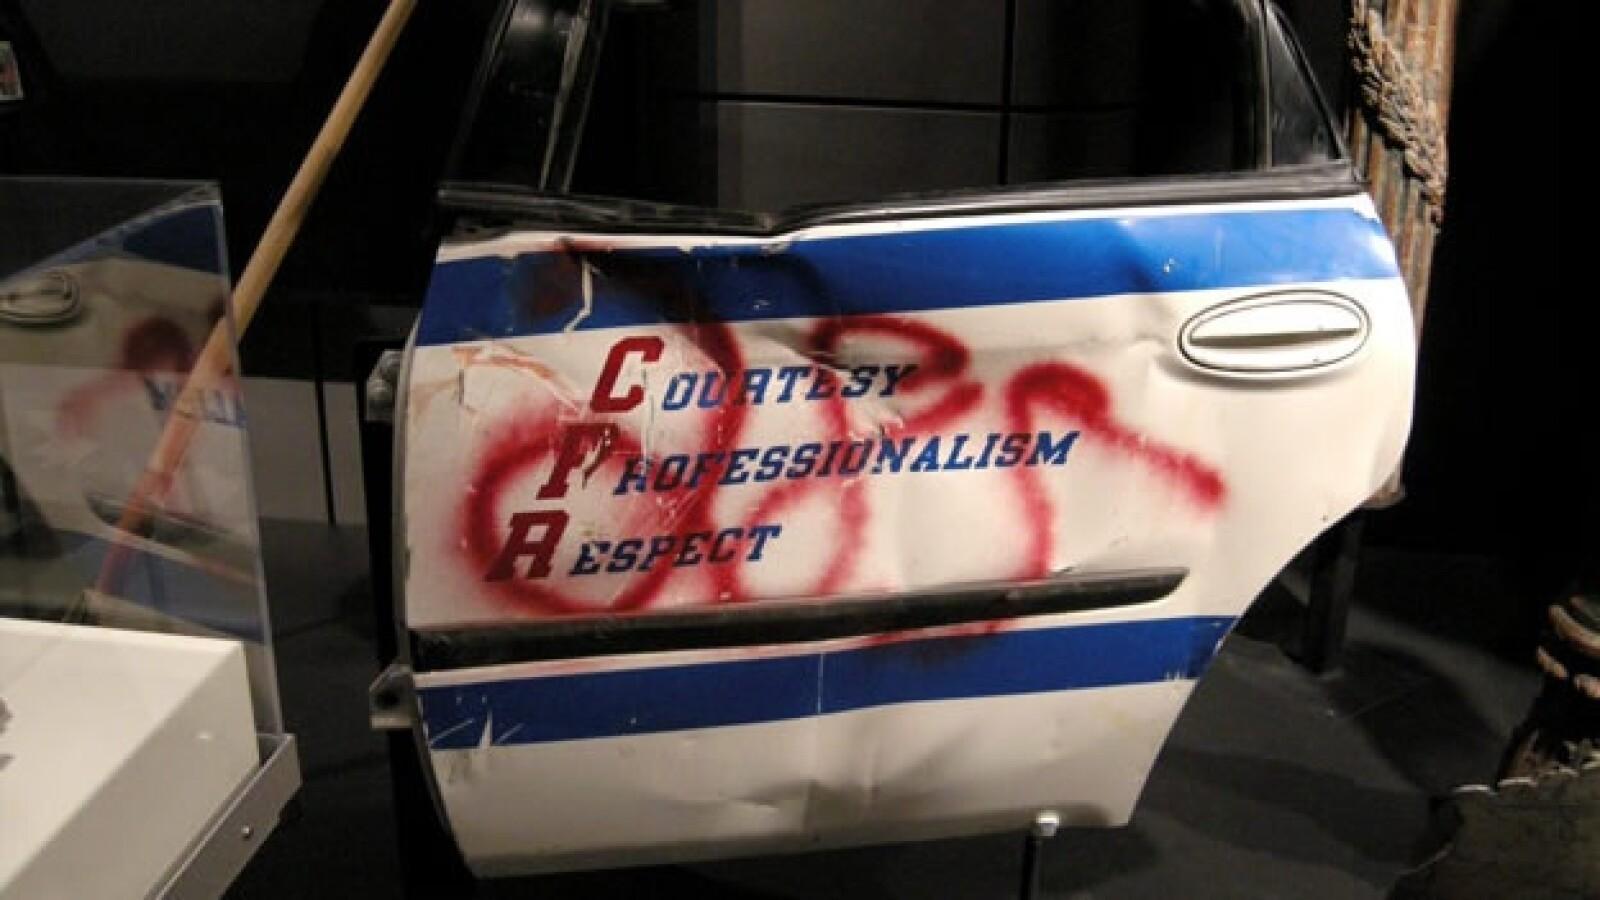 11-S - Newseum - pieza de patrulla